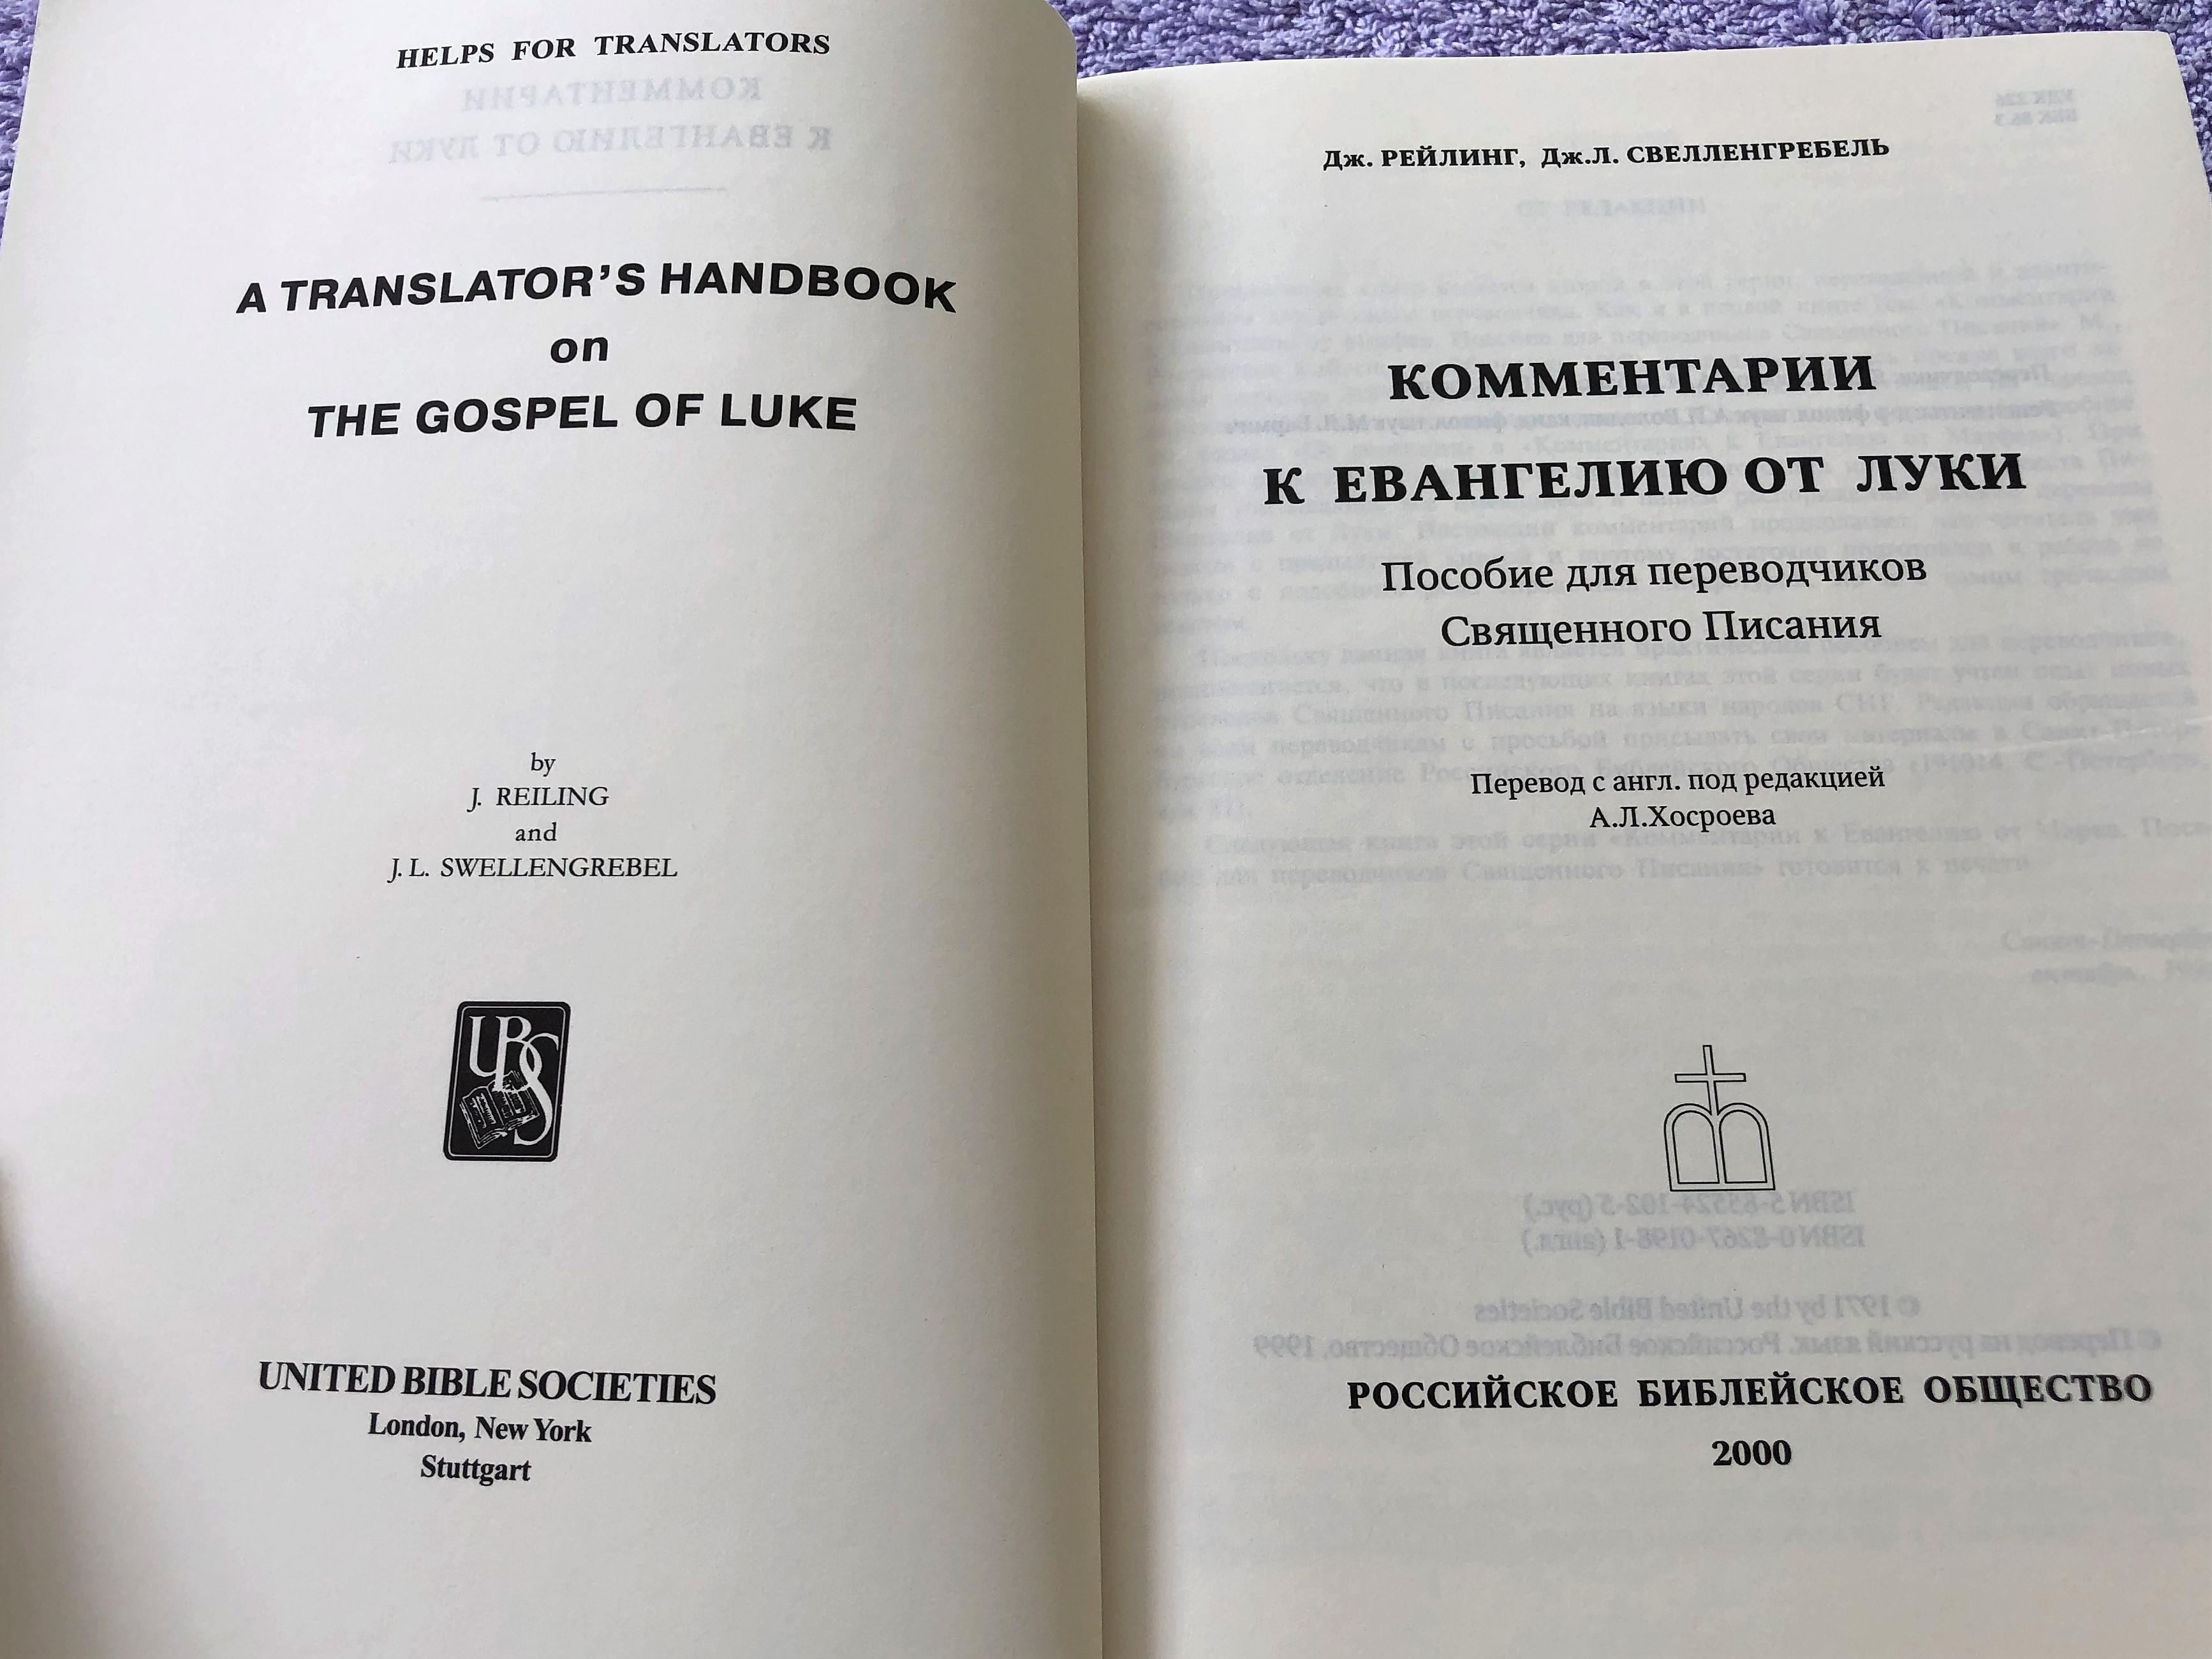 russian-language-edition-of-the-helps-for-bible-translators-a-translator-s-handbook-on-the-gospel-of-luke-3-.jpg